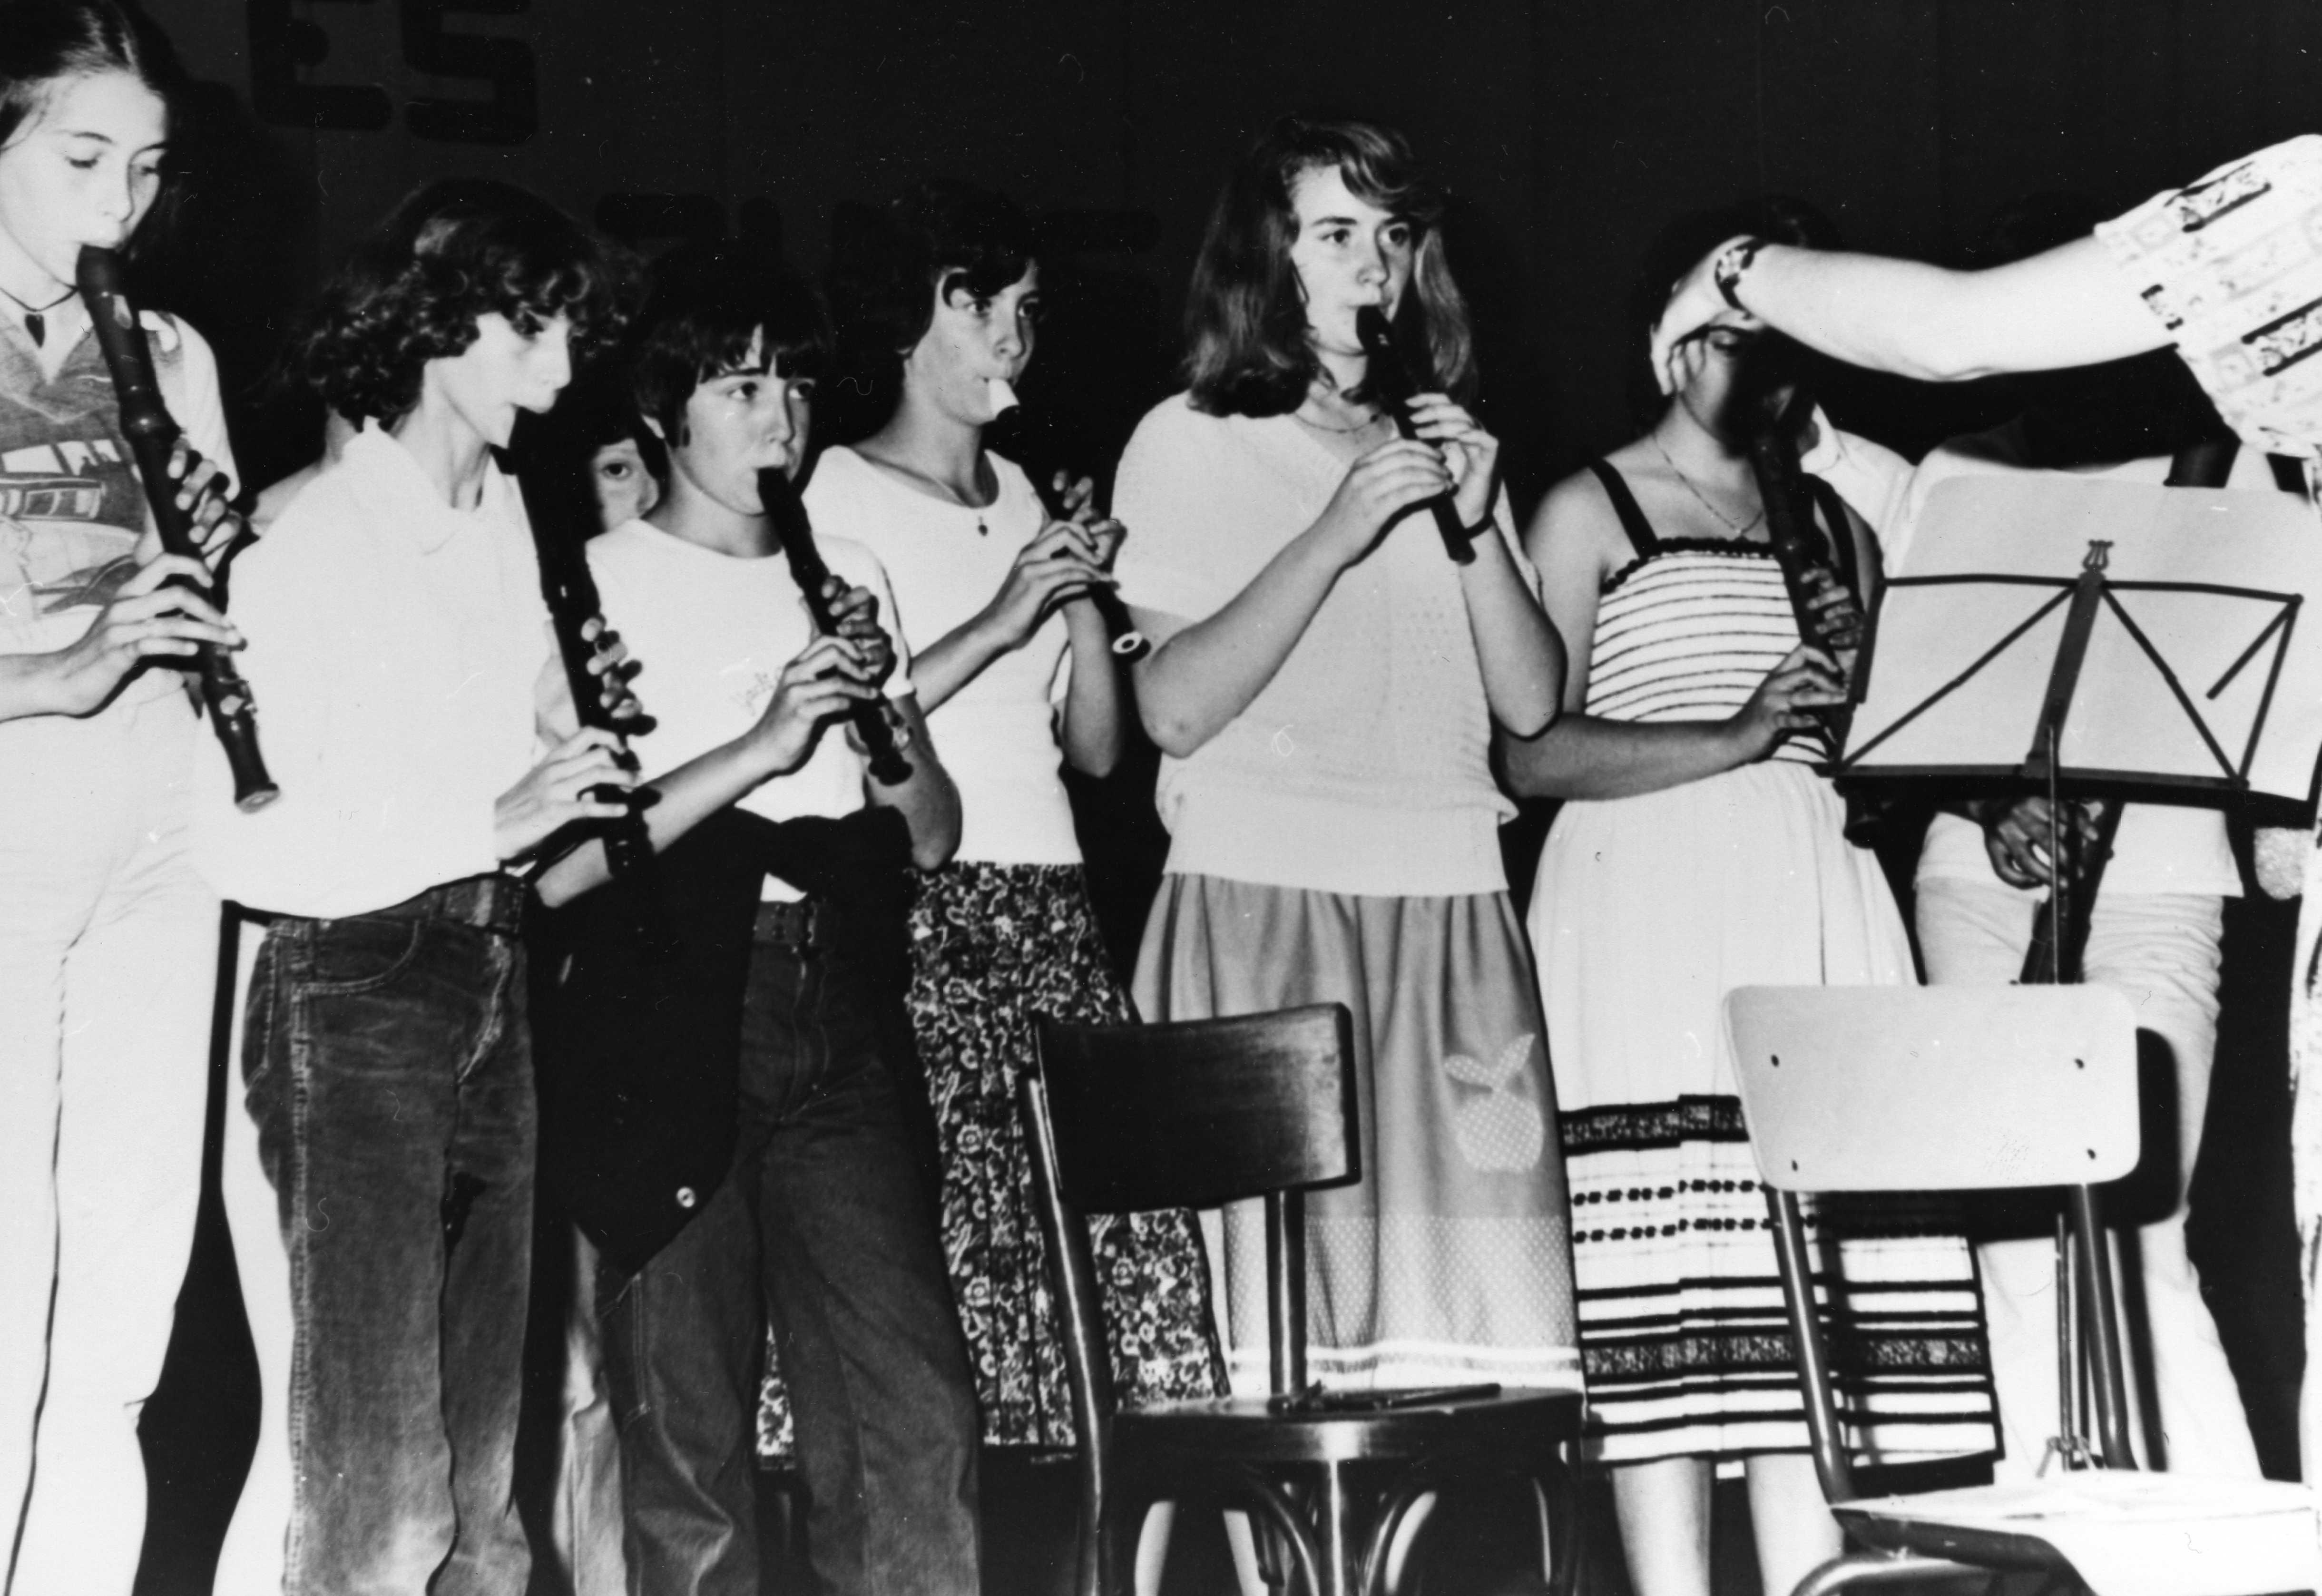 Orchestre1 1980